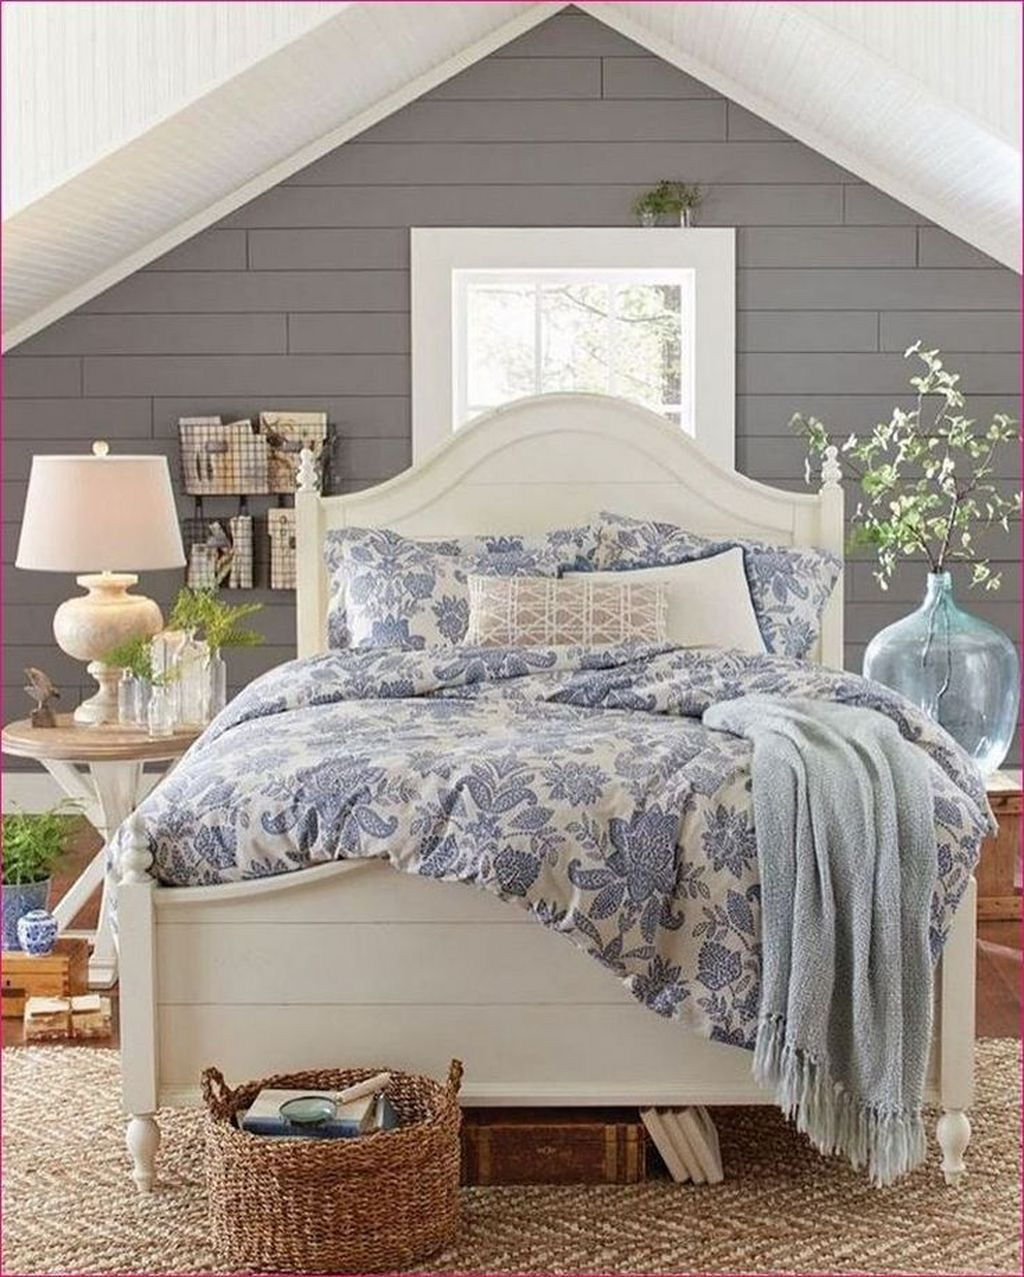 50 Cozy Farmhouse Master Bedroom Remodel Ideas: Gorgeous Bedroom Design Decor Ideas For Kids 35